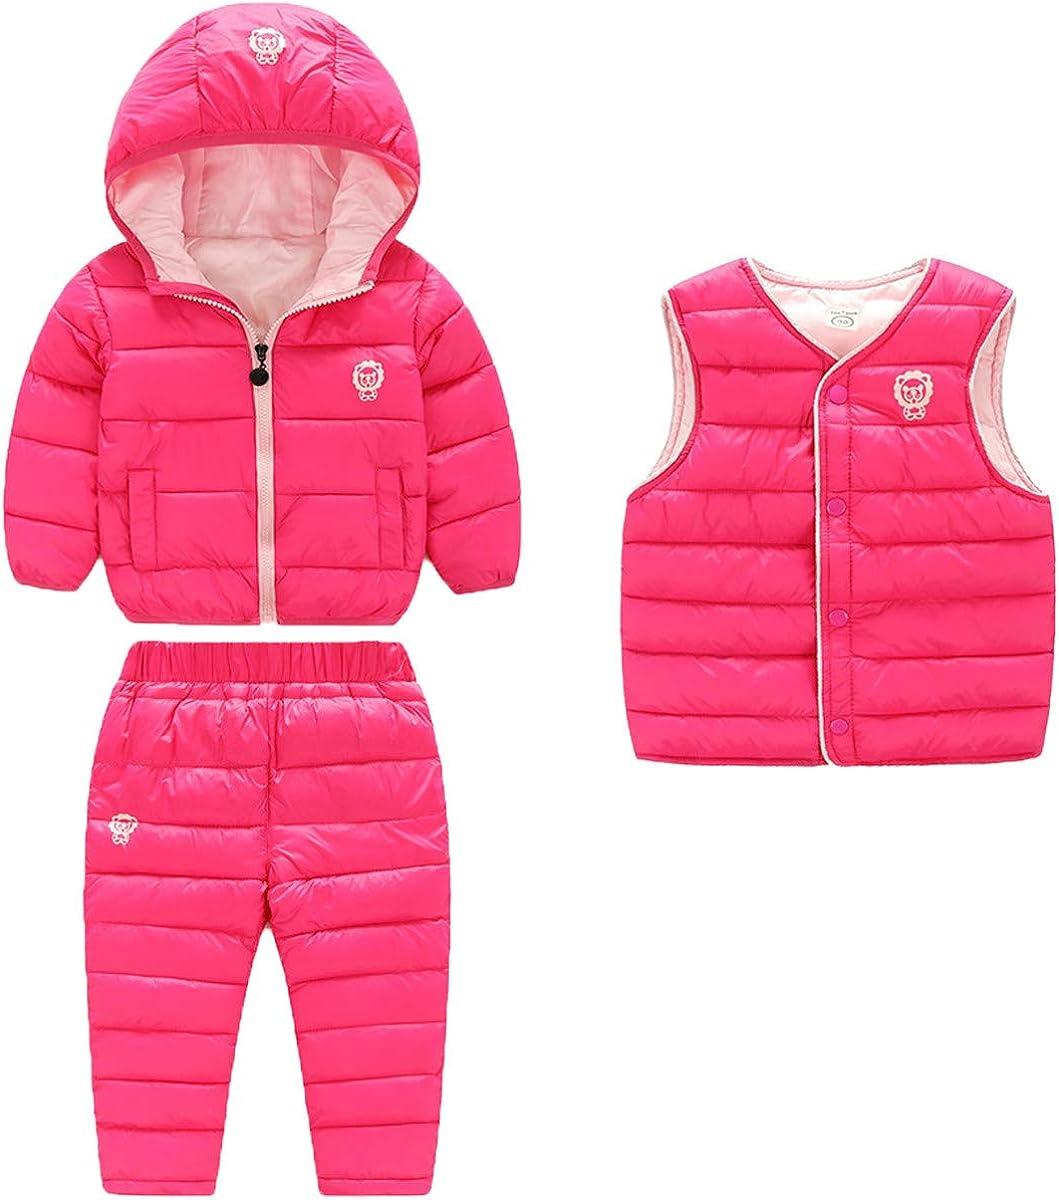 3 Piece Baby Boys Girls Windproof Winter Warm Down Jacket+Ski Pants+Vest Outfit Cotton-Padded Snowsuits Set